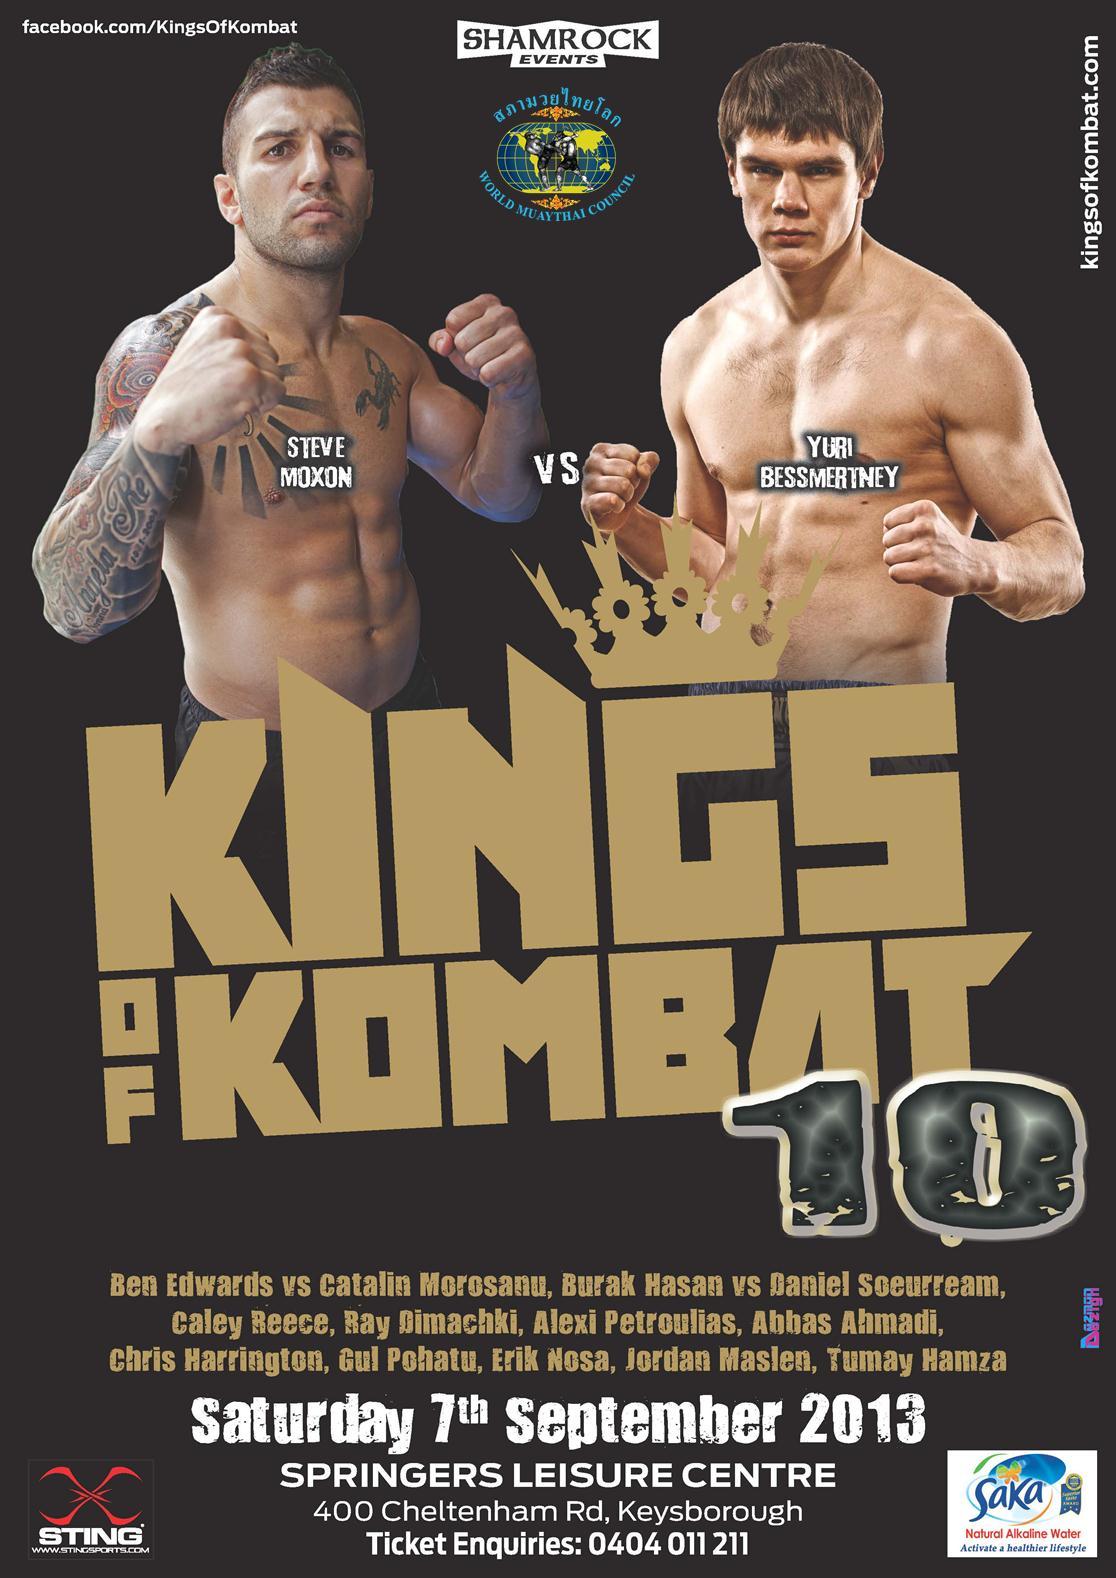 Kings of Kombat 10 Sep13 A4 MOX